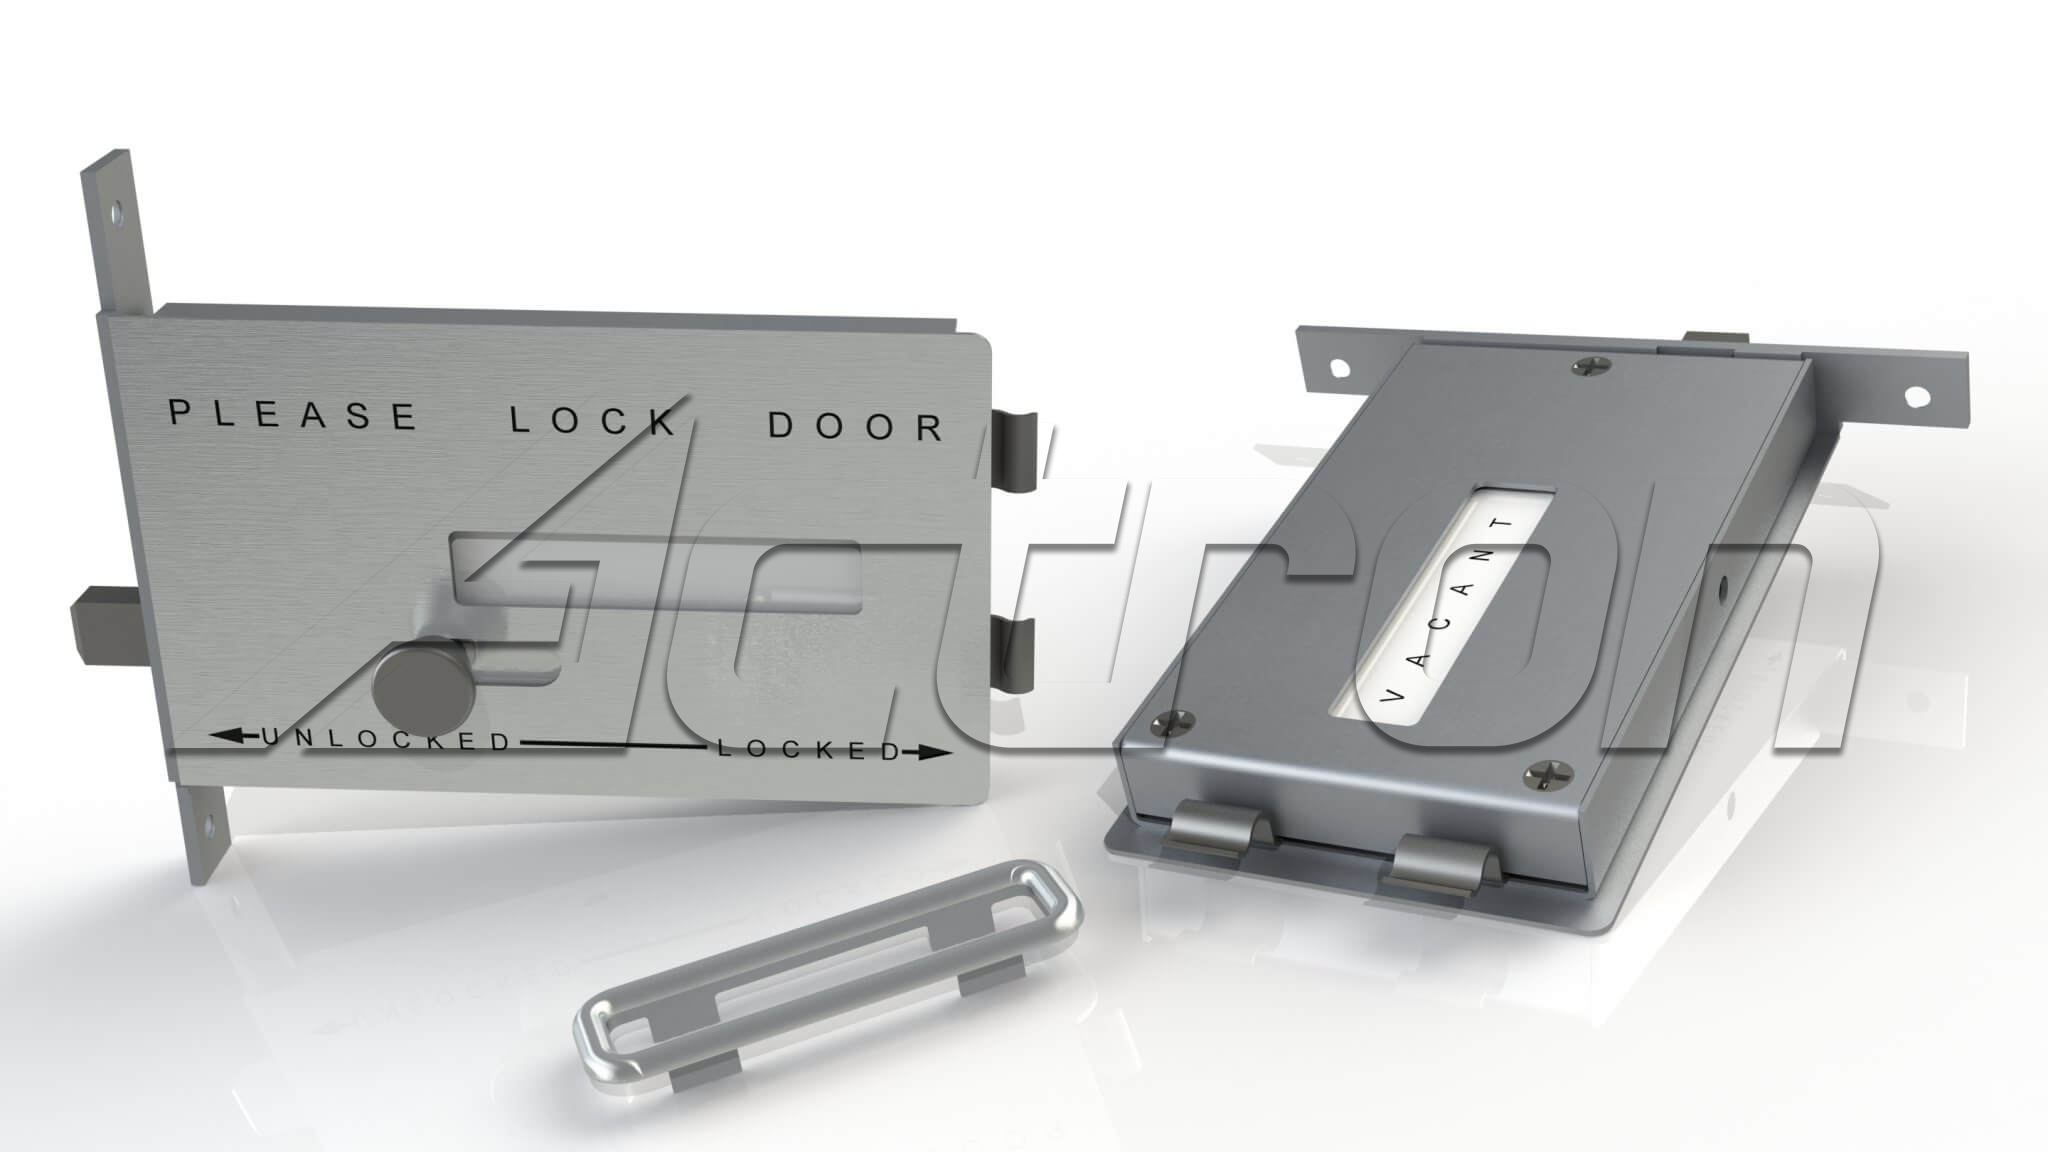 latch-assy-8211-lavatory-4951-a41006.jpg